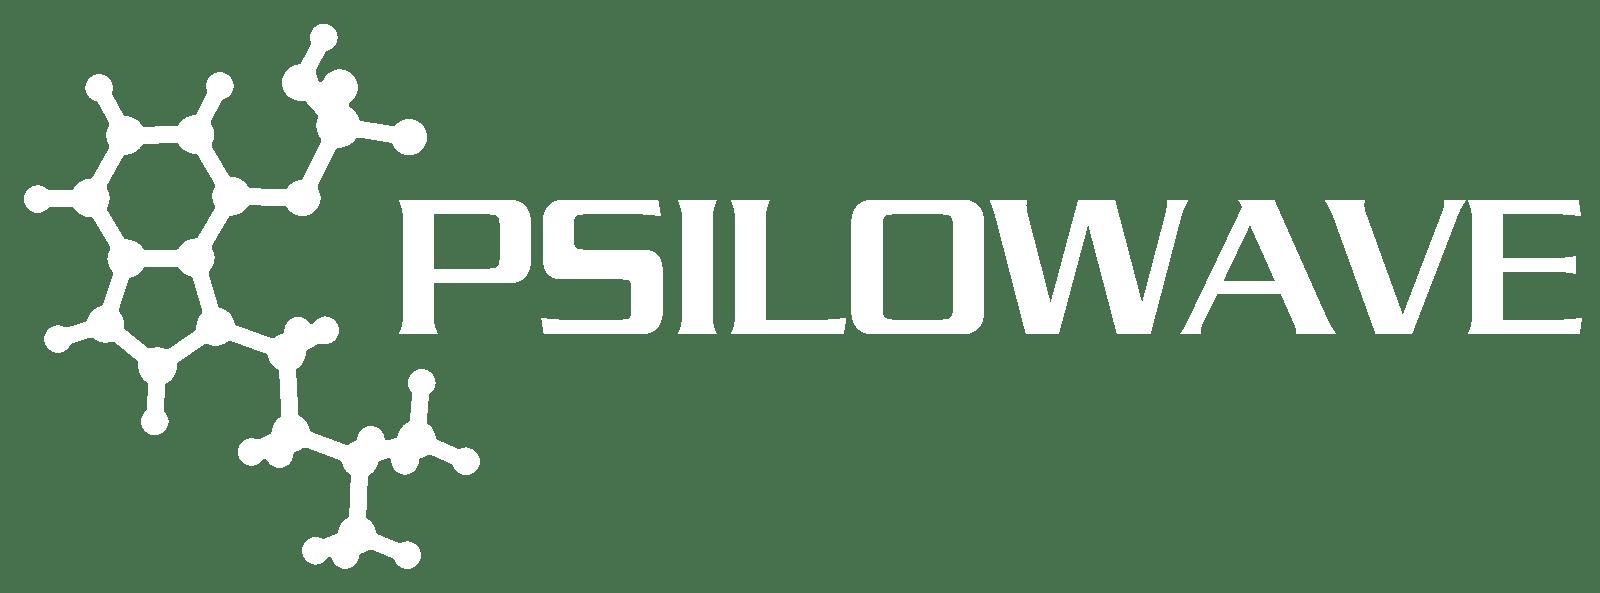 Psilowave